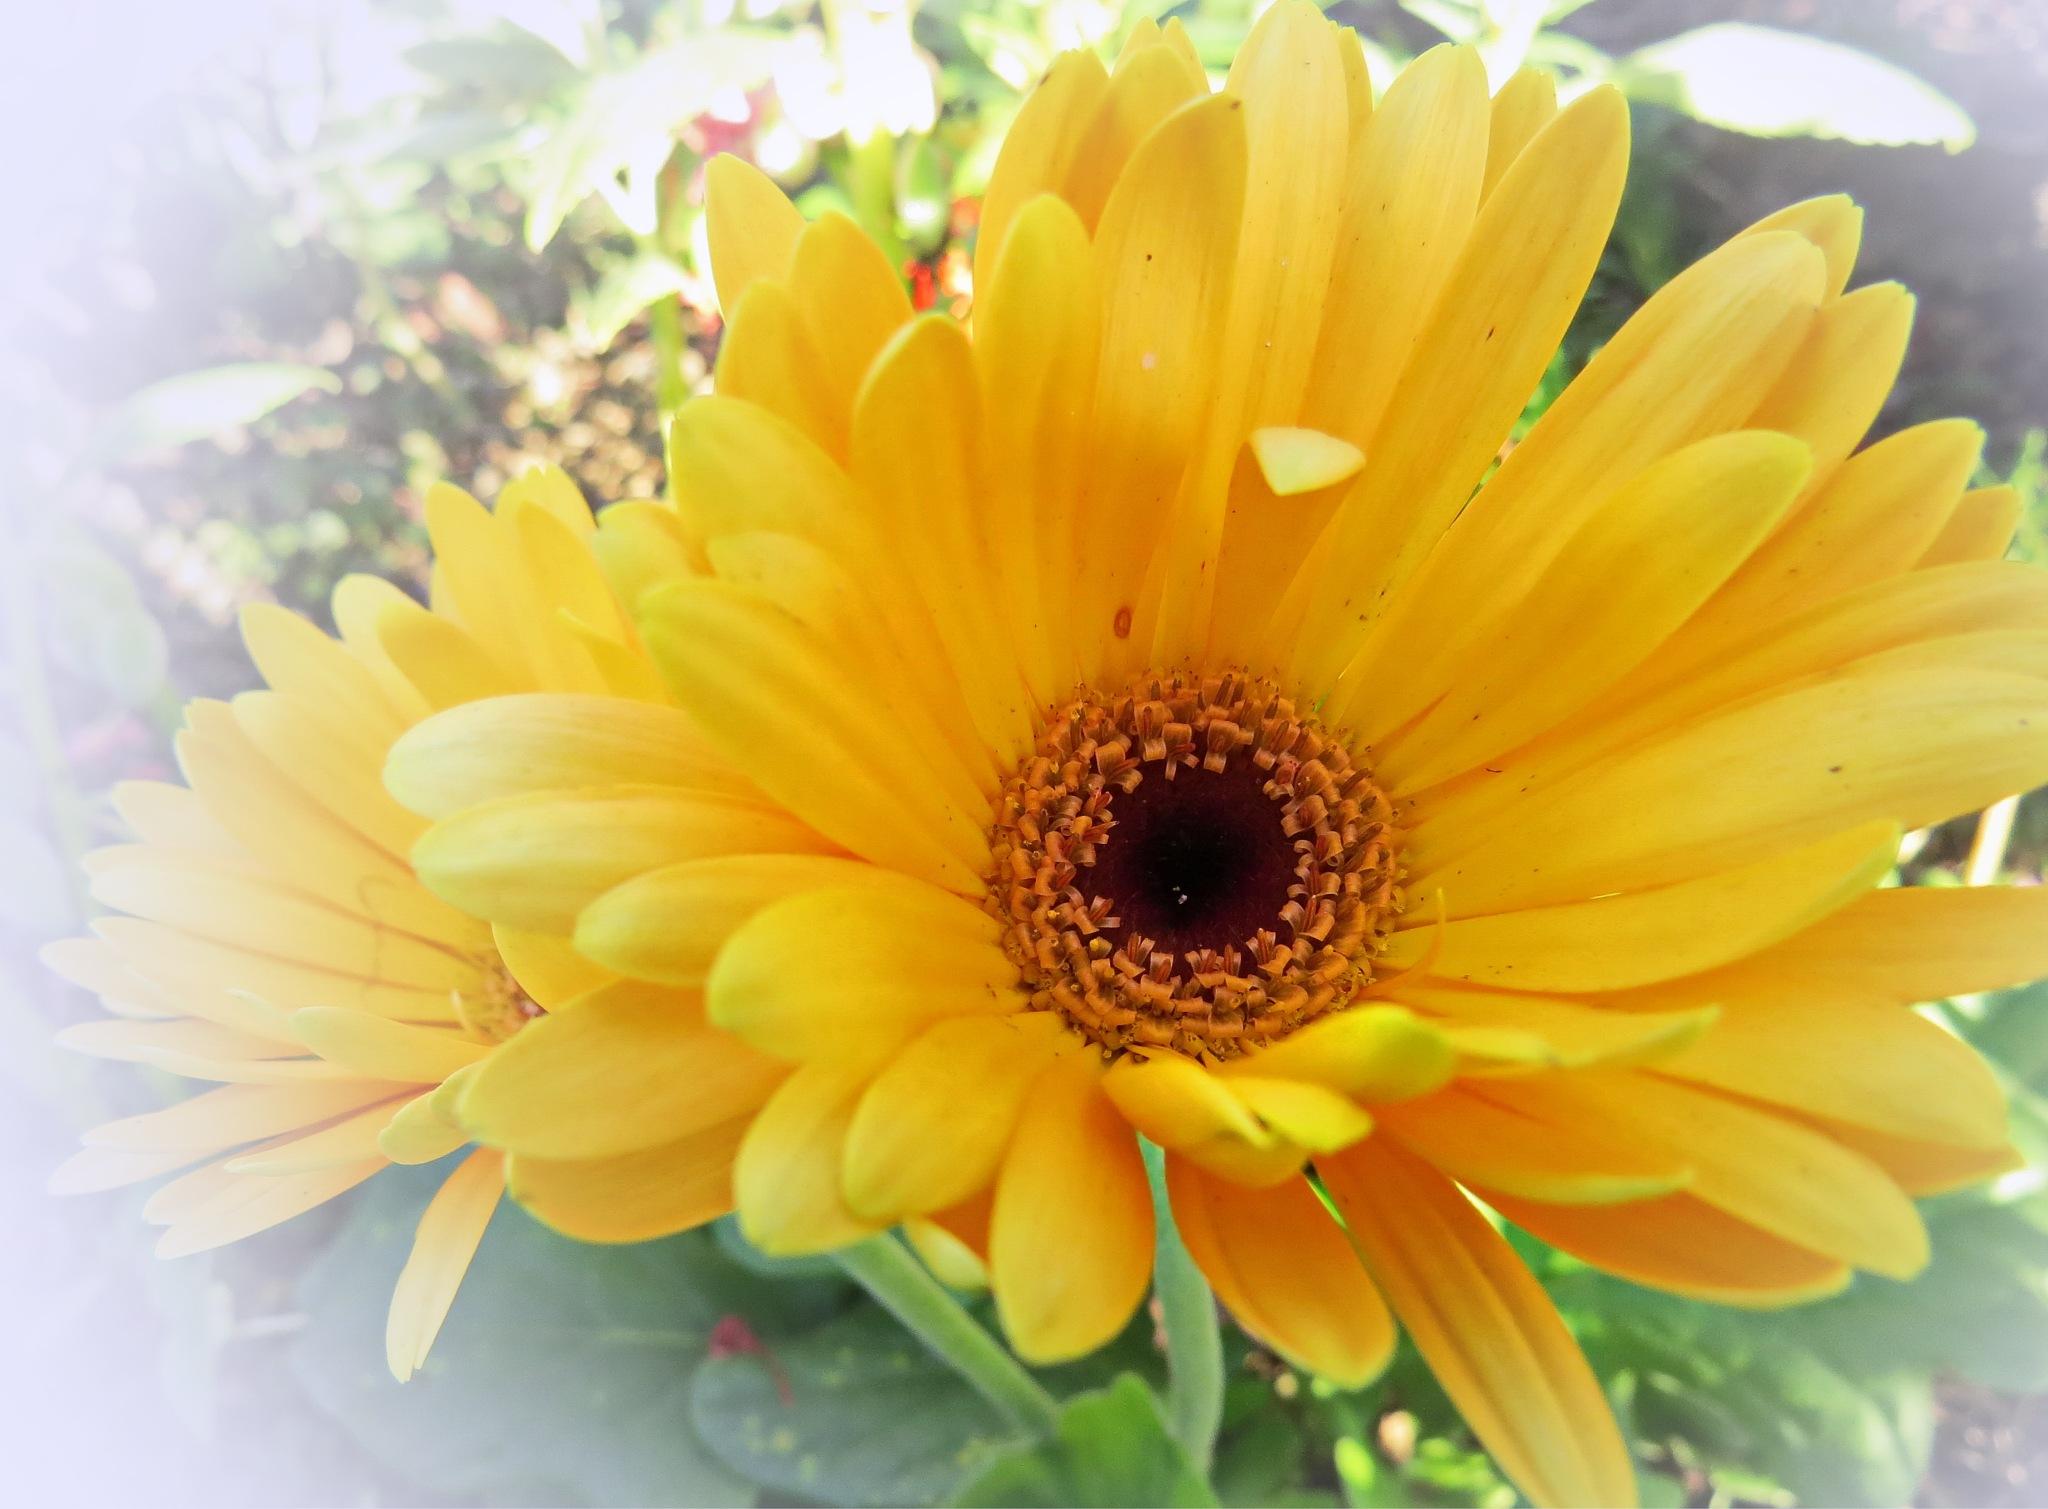 Yellow daisy by Nestor